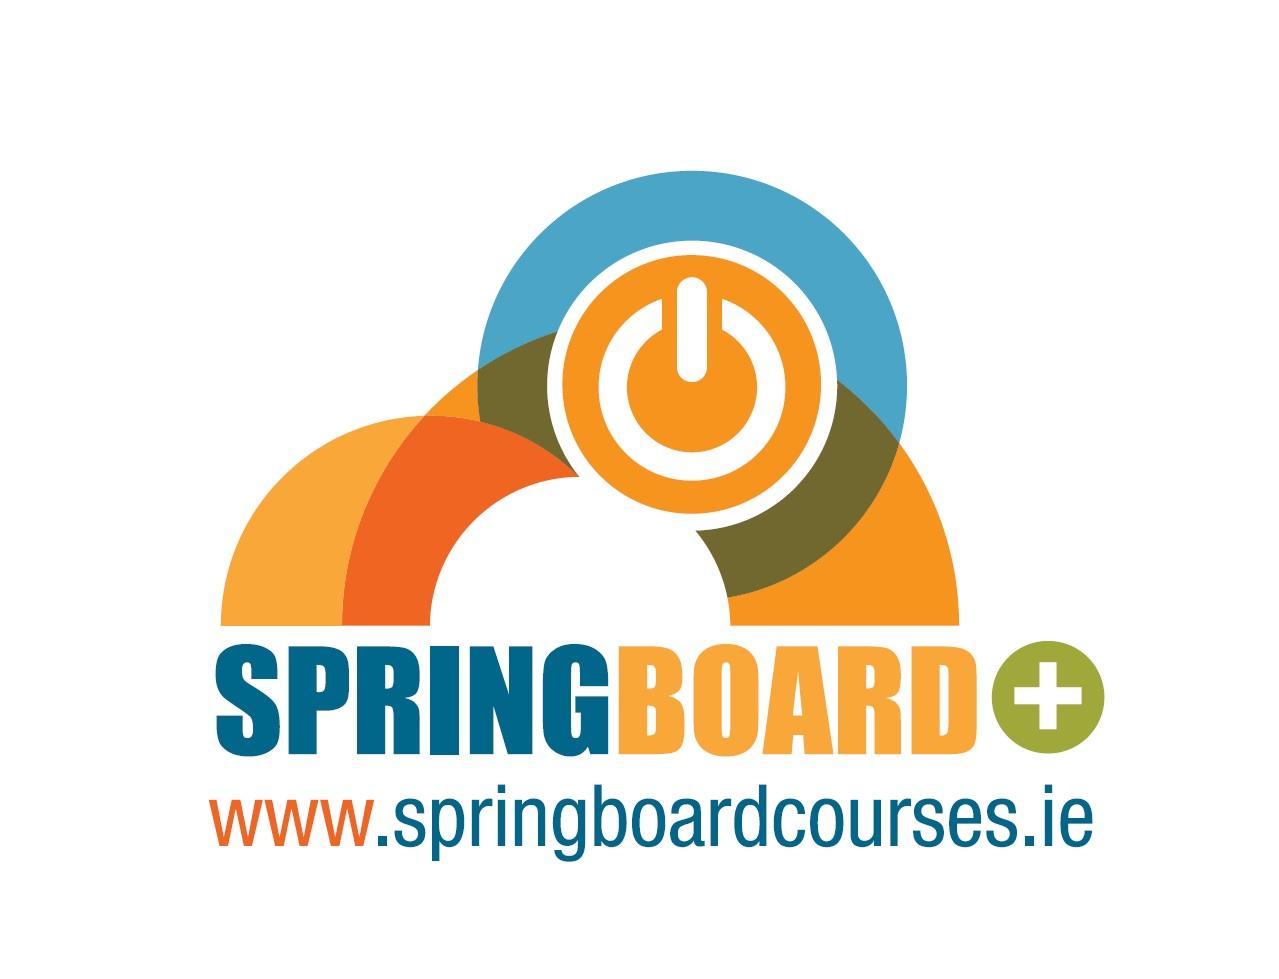 https://lit.ie/admin/LIT/media/LIT/Flexible%20Learning/springboard-_logo.jpg